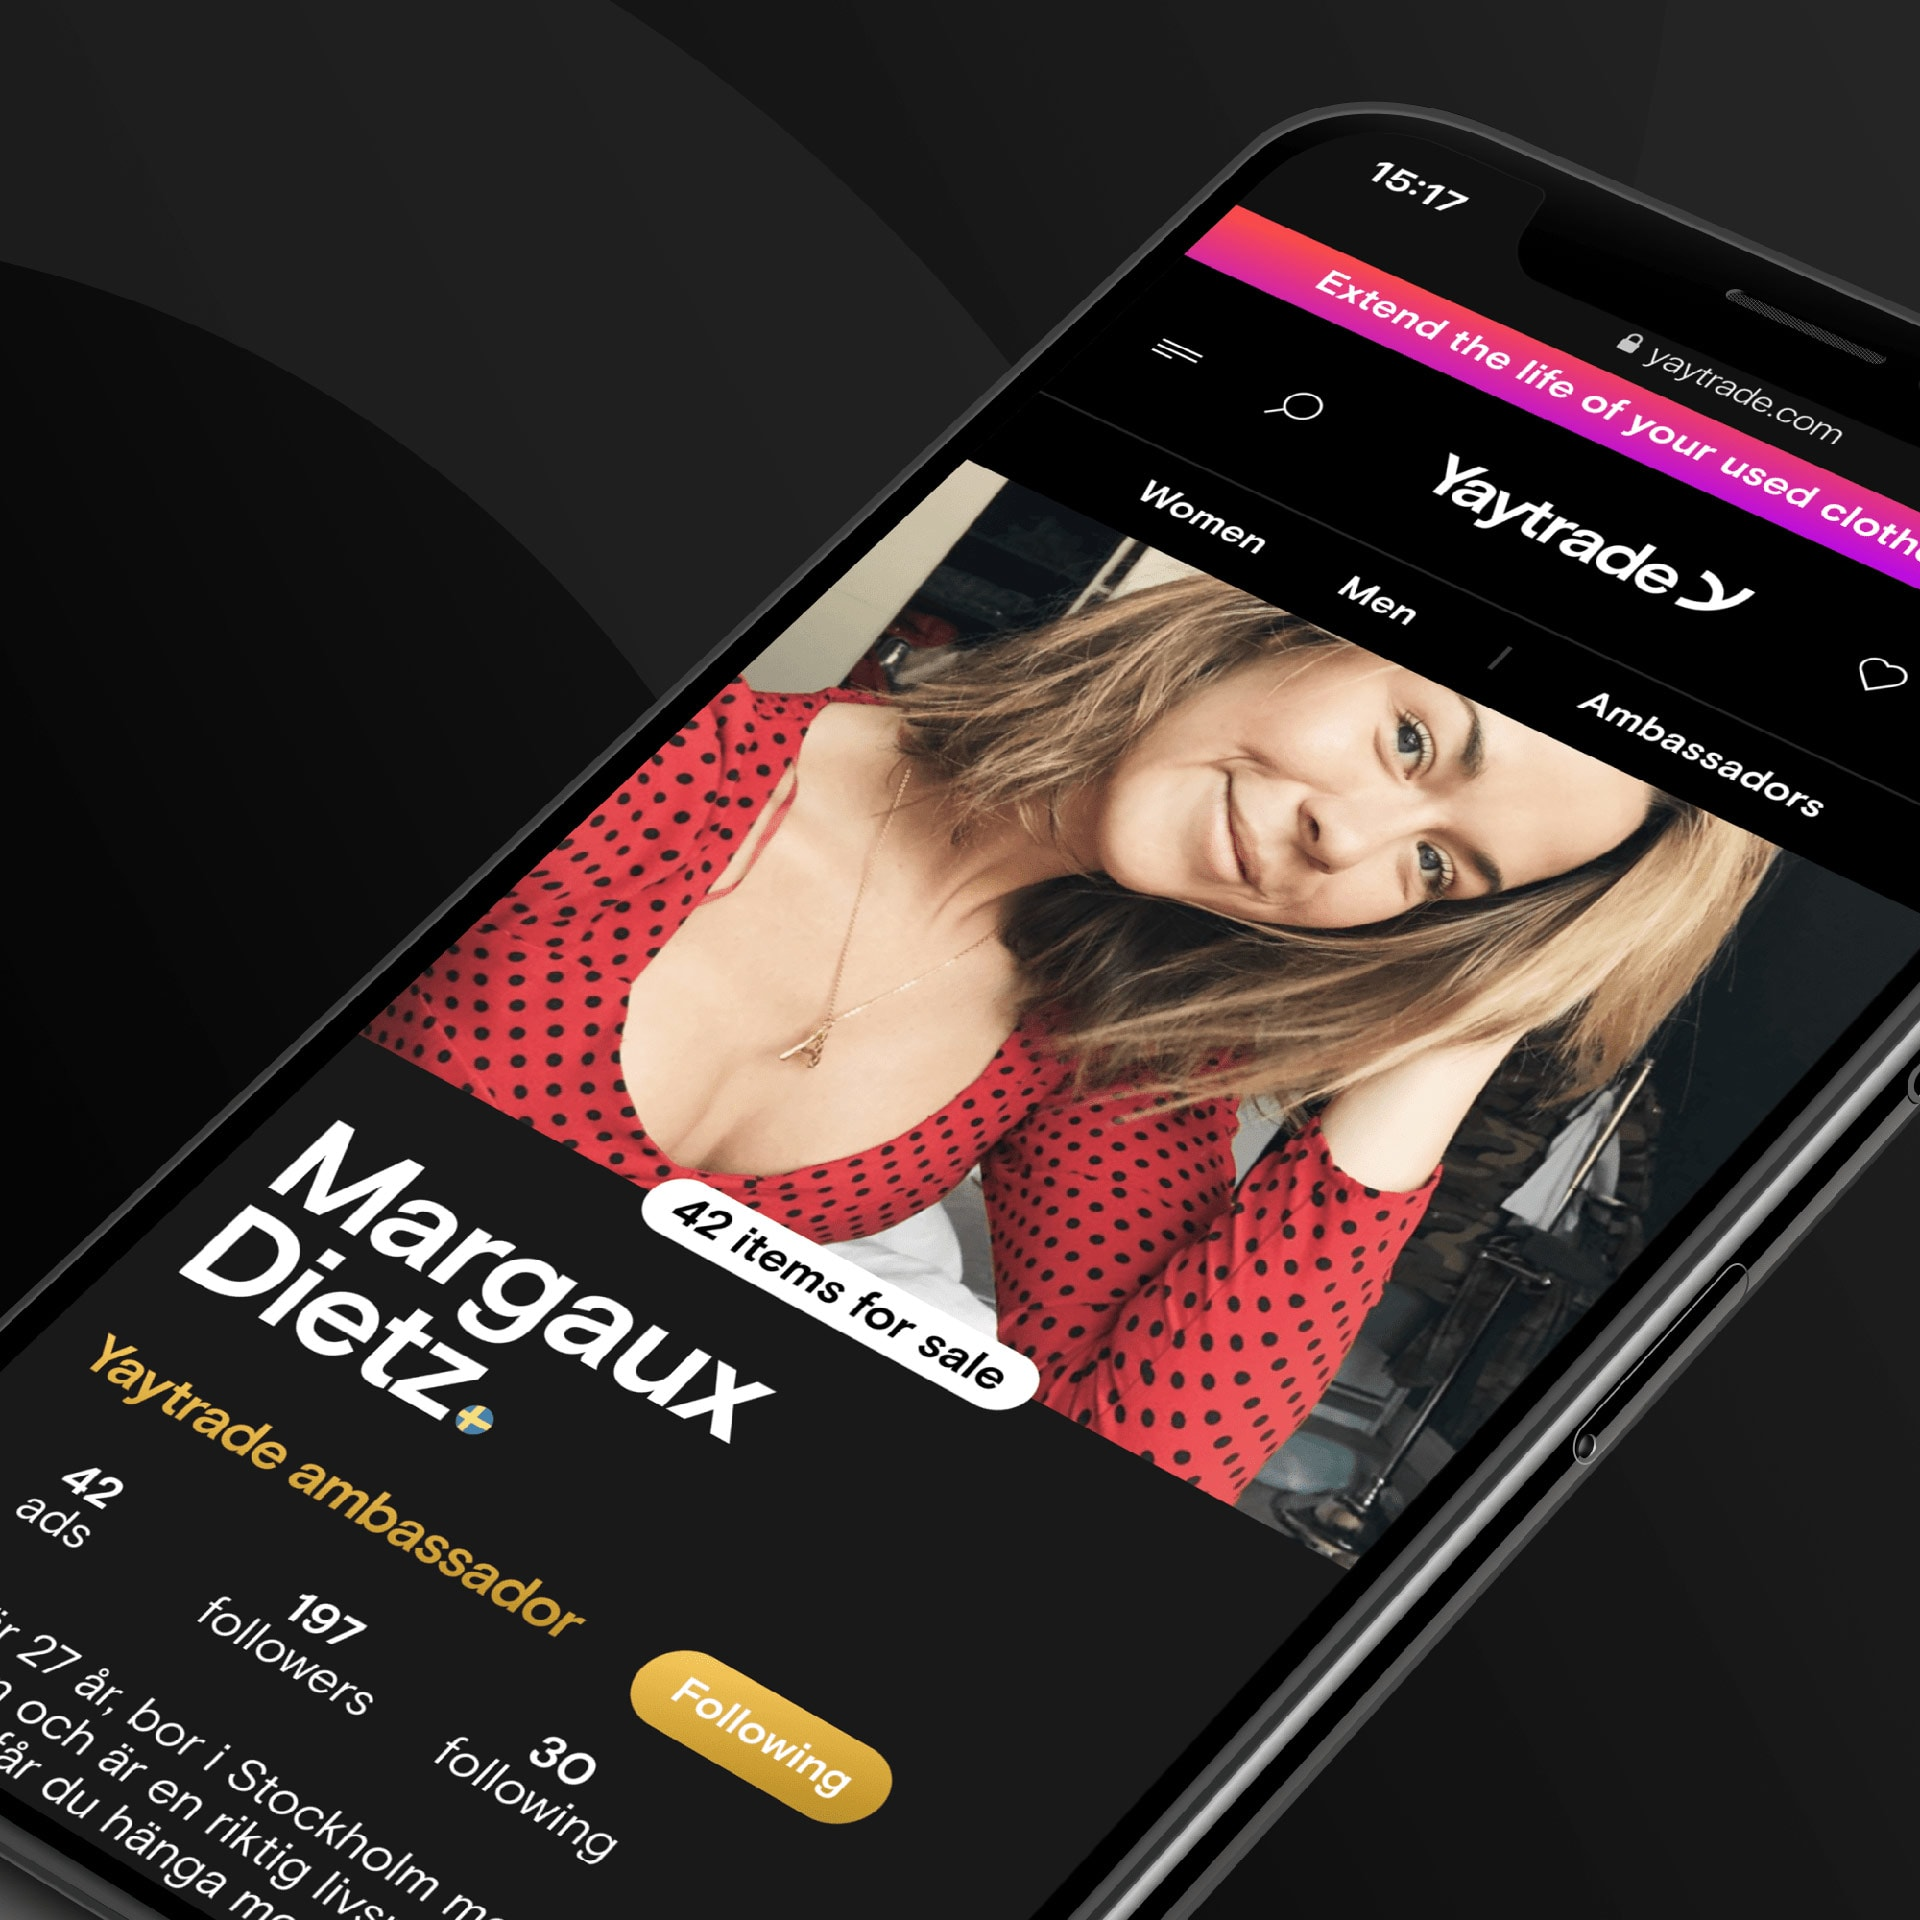 The debut of Yaytrade's fresh new platform design